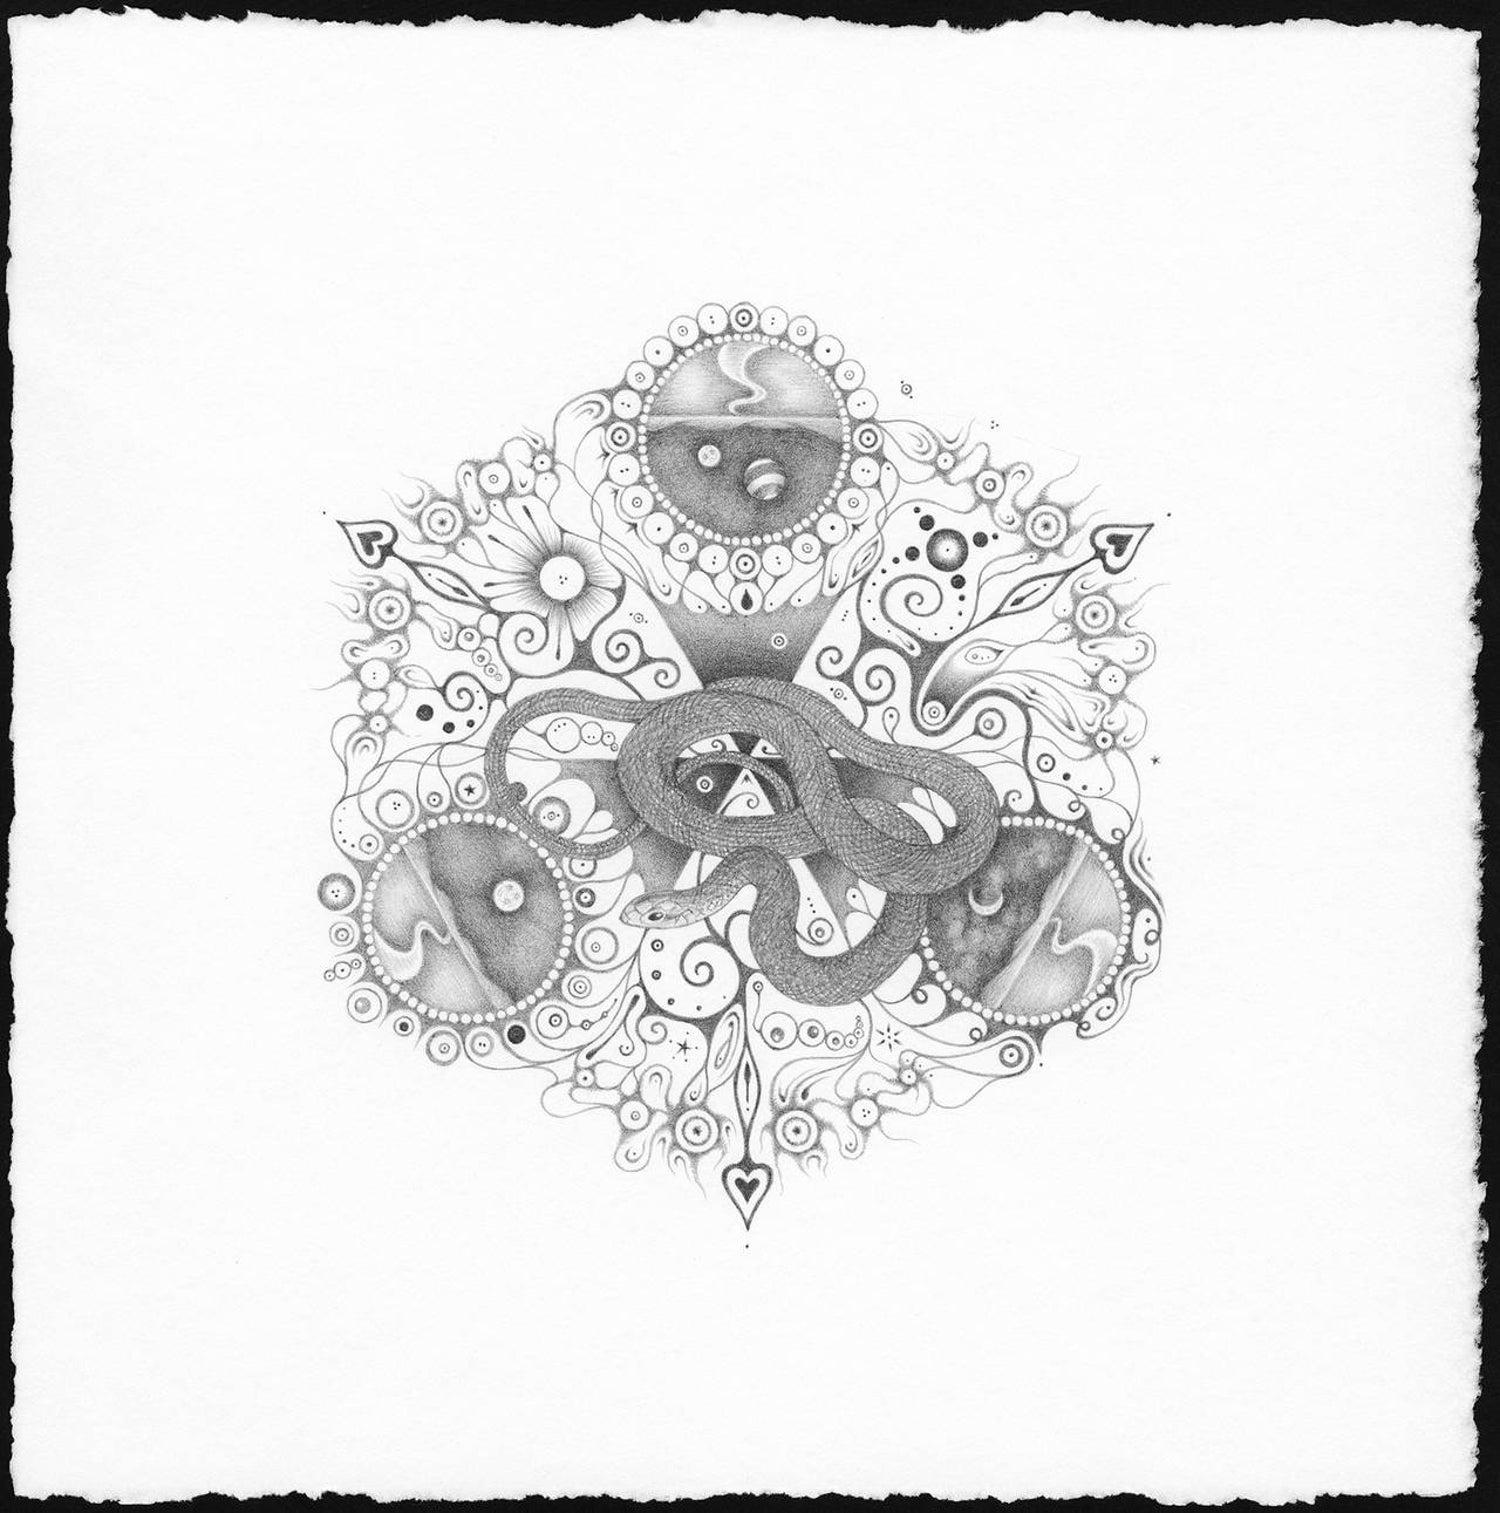 Snowflakes 120 messenger mandala pencil drawing snakes moon planets